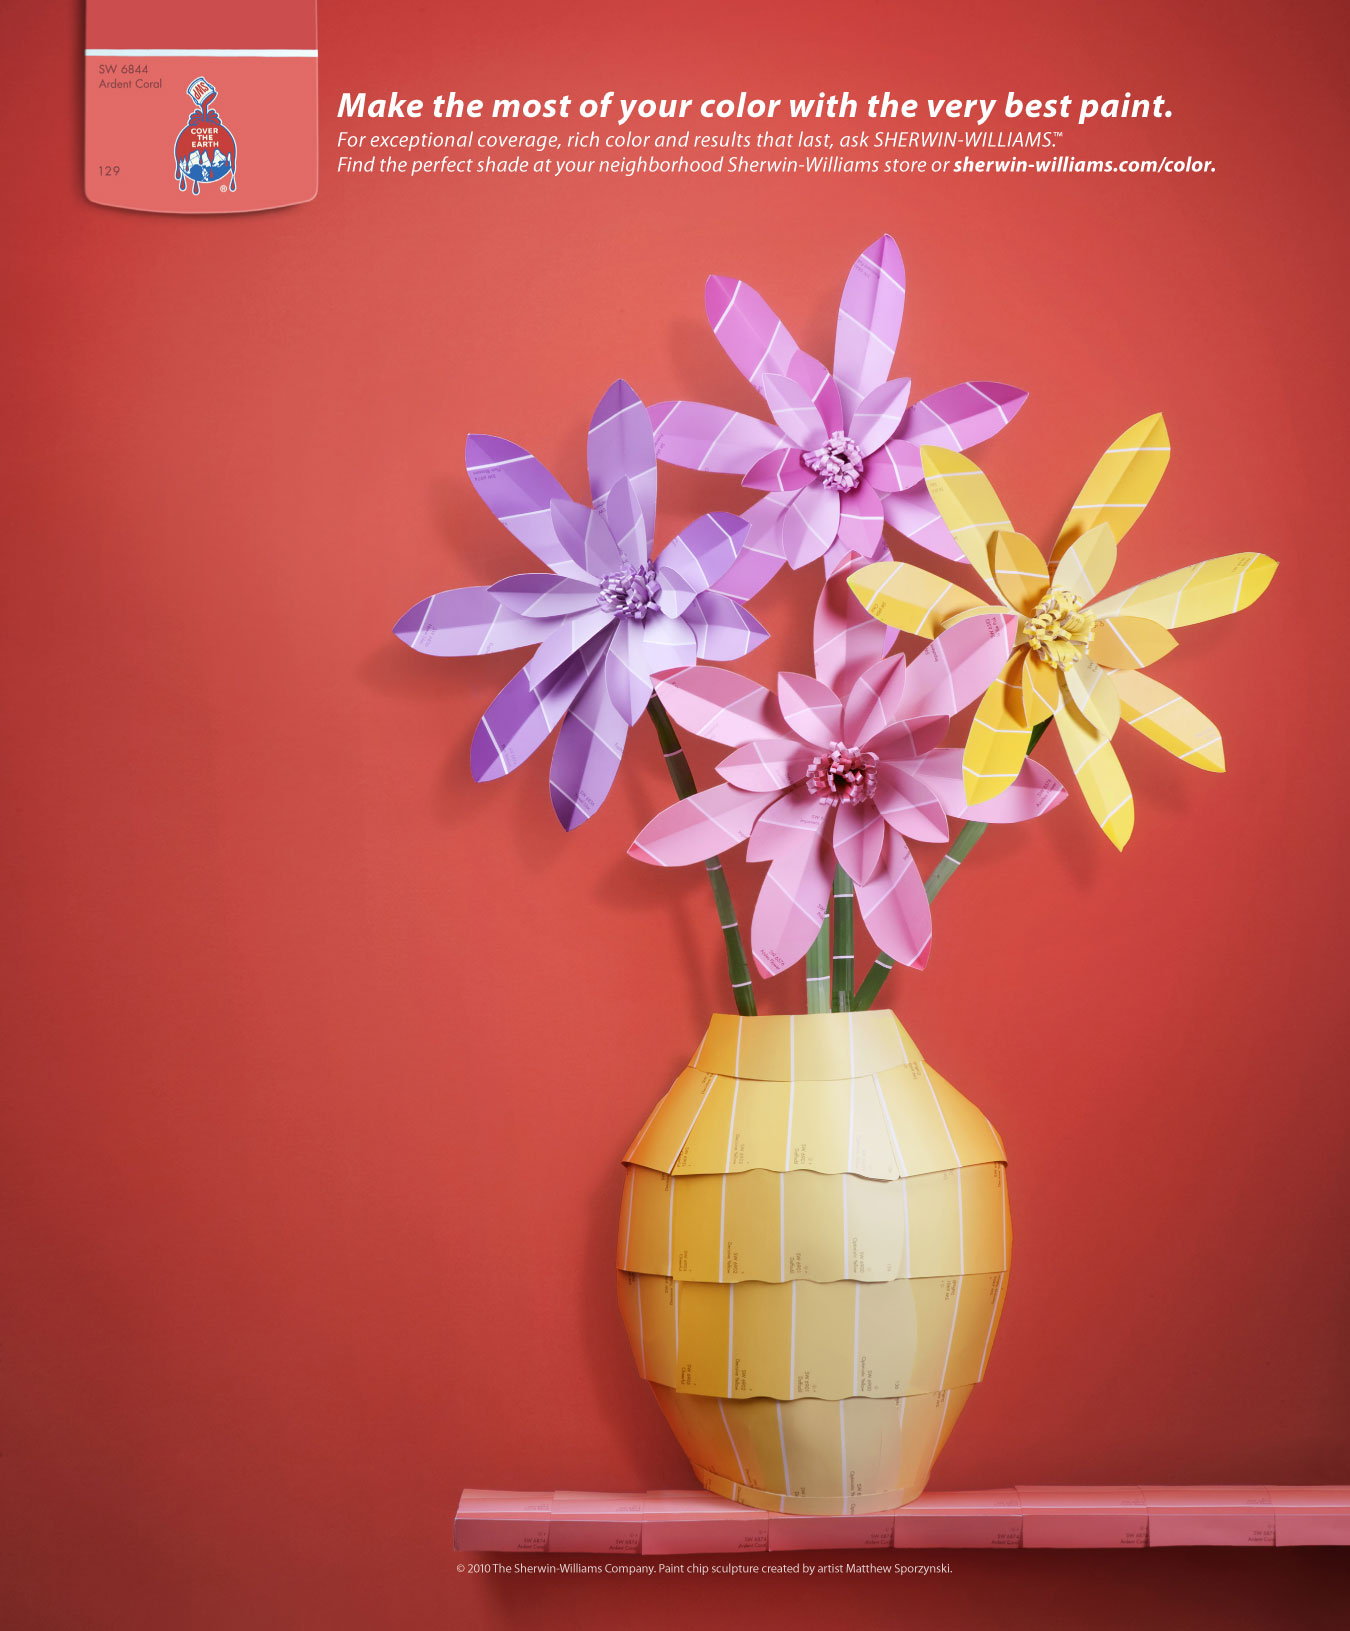 Sherwin-Williams: Flowers - Print (image) - Creativity Online